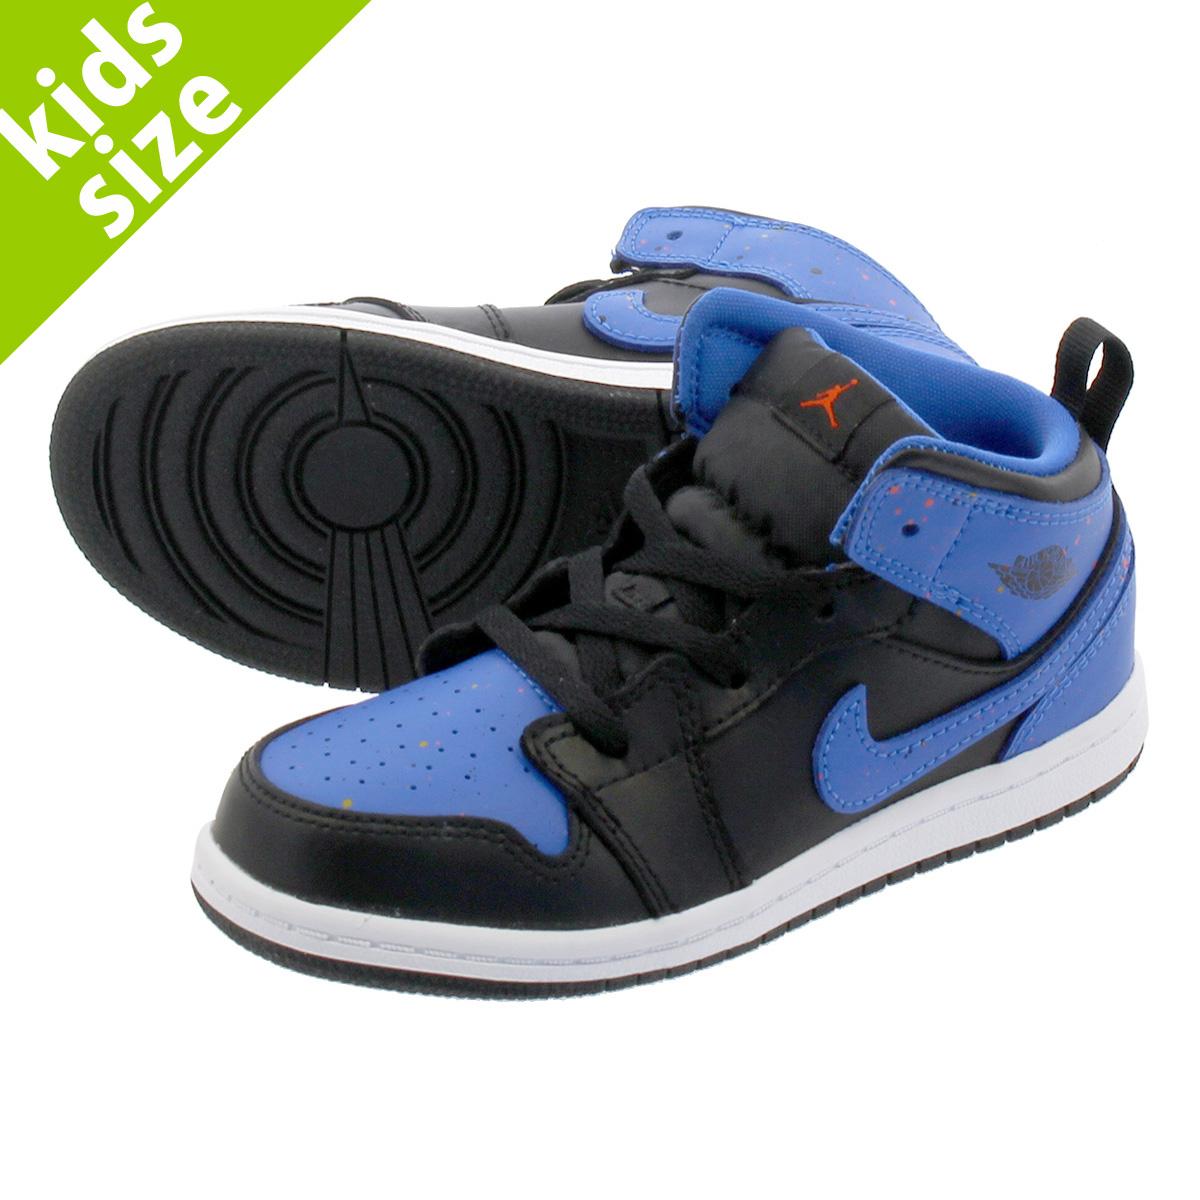 NIKE AIR JORDAN 1 MID BT Nike Air Jordan 1 mid BT BLACK SIGNAL BLUE TEAM  ORANGE 640 12f5fe293